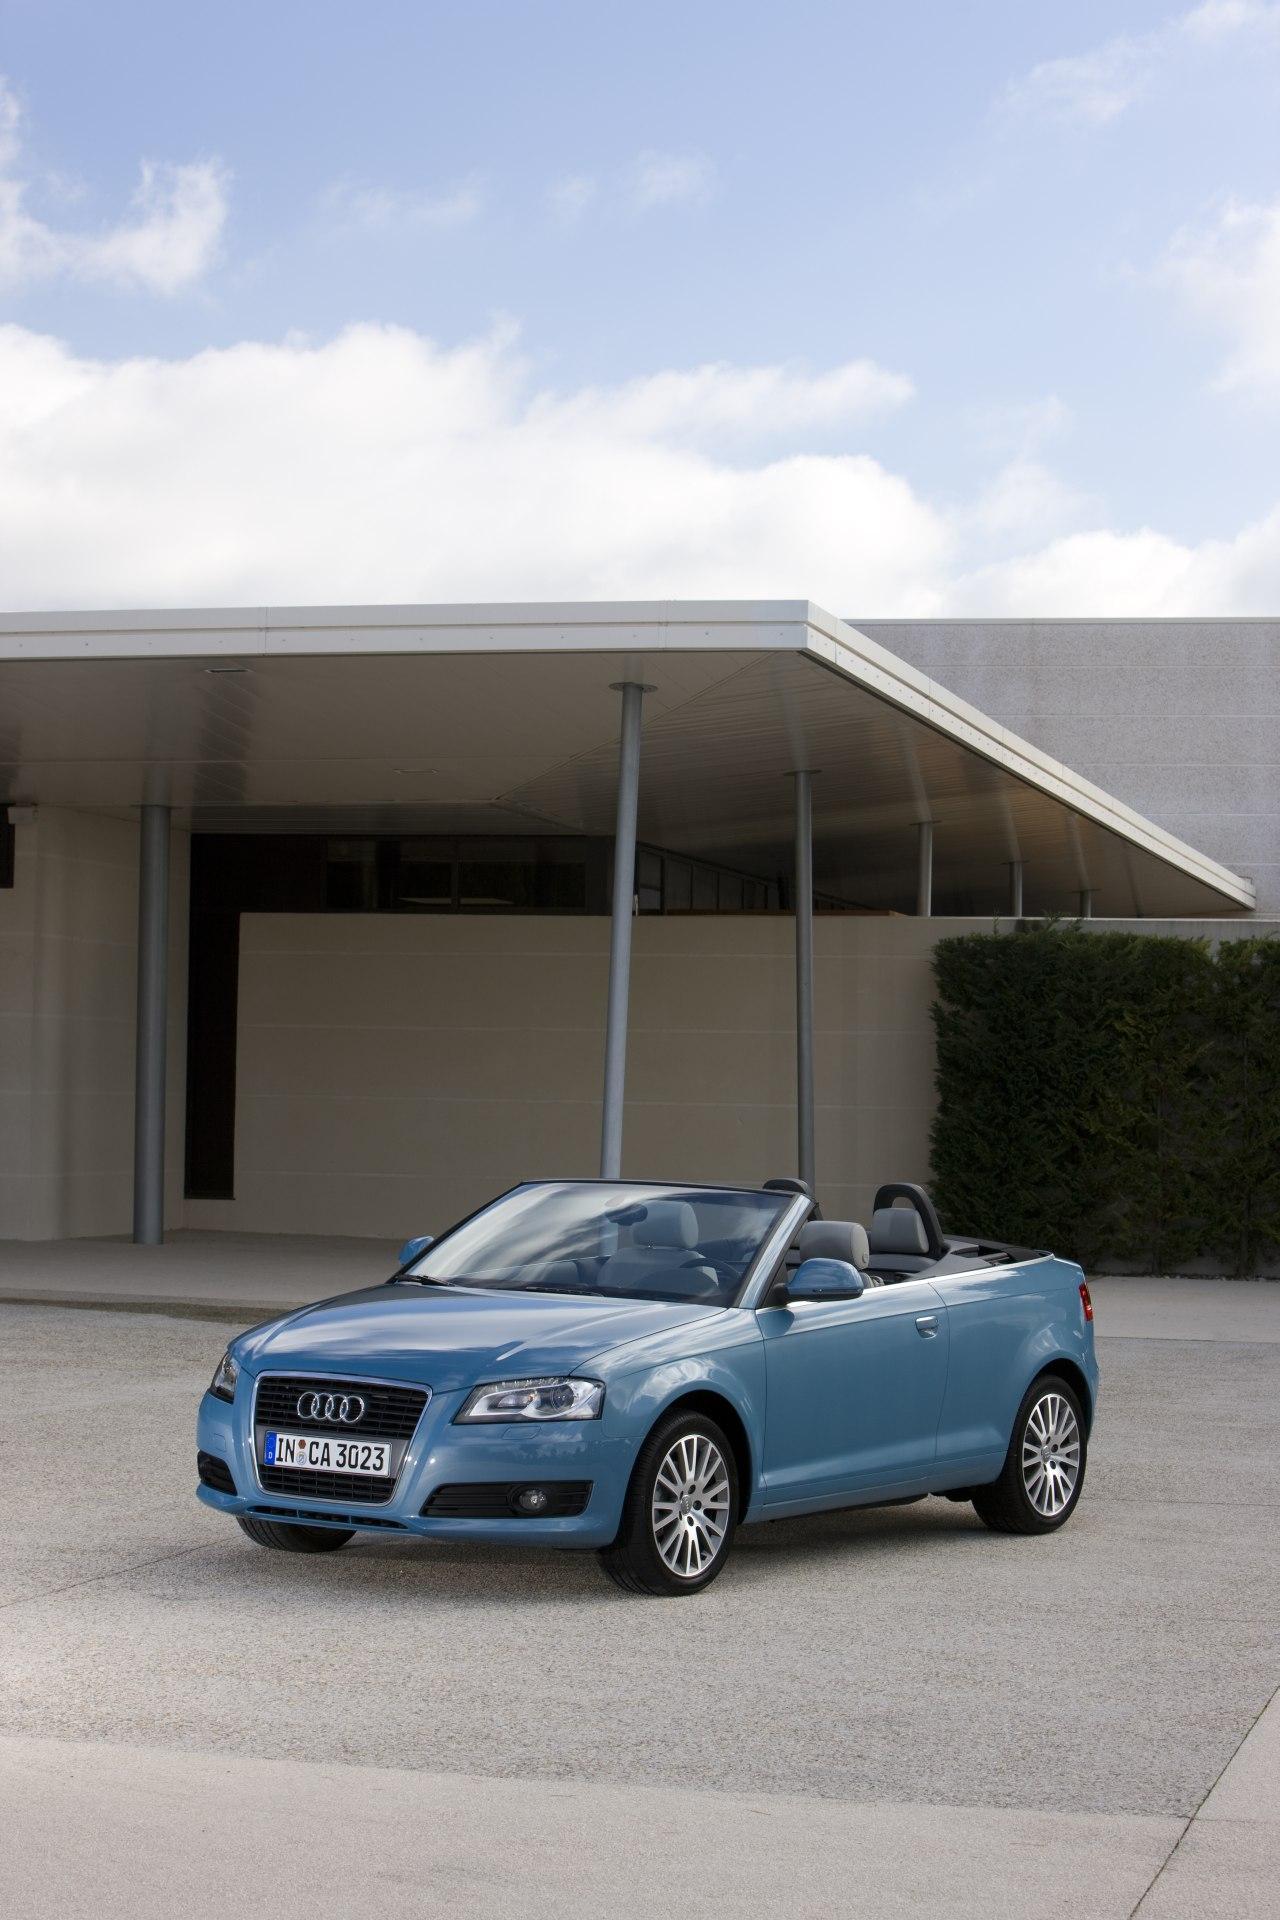 Audi_A3_Cabriolet.jpg